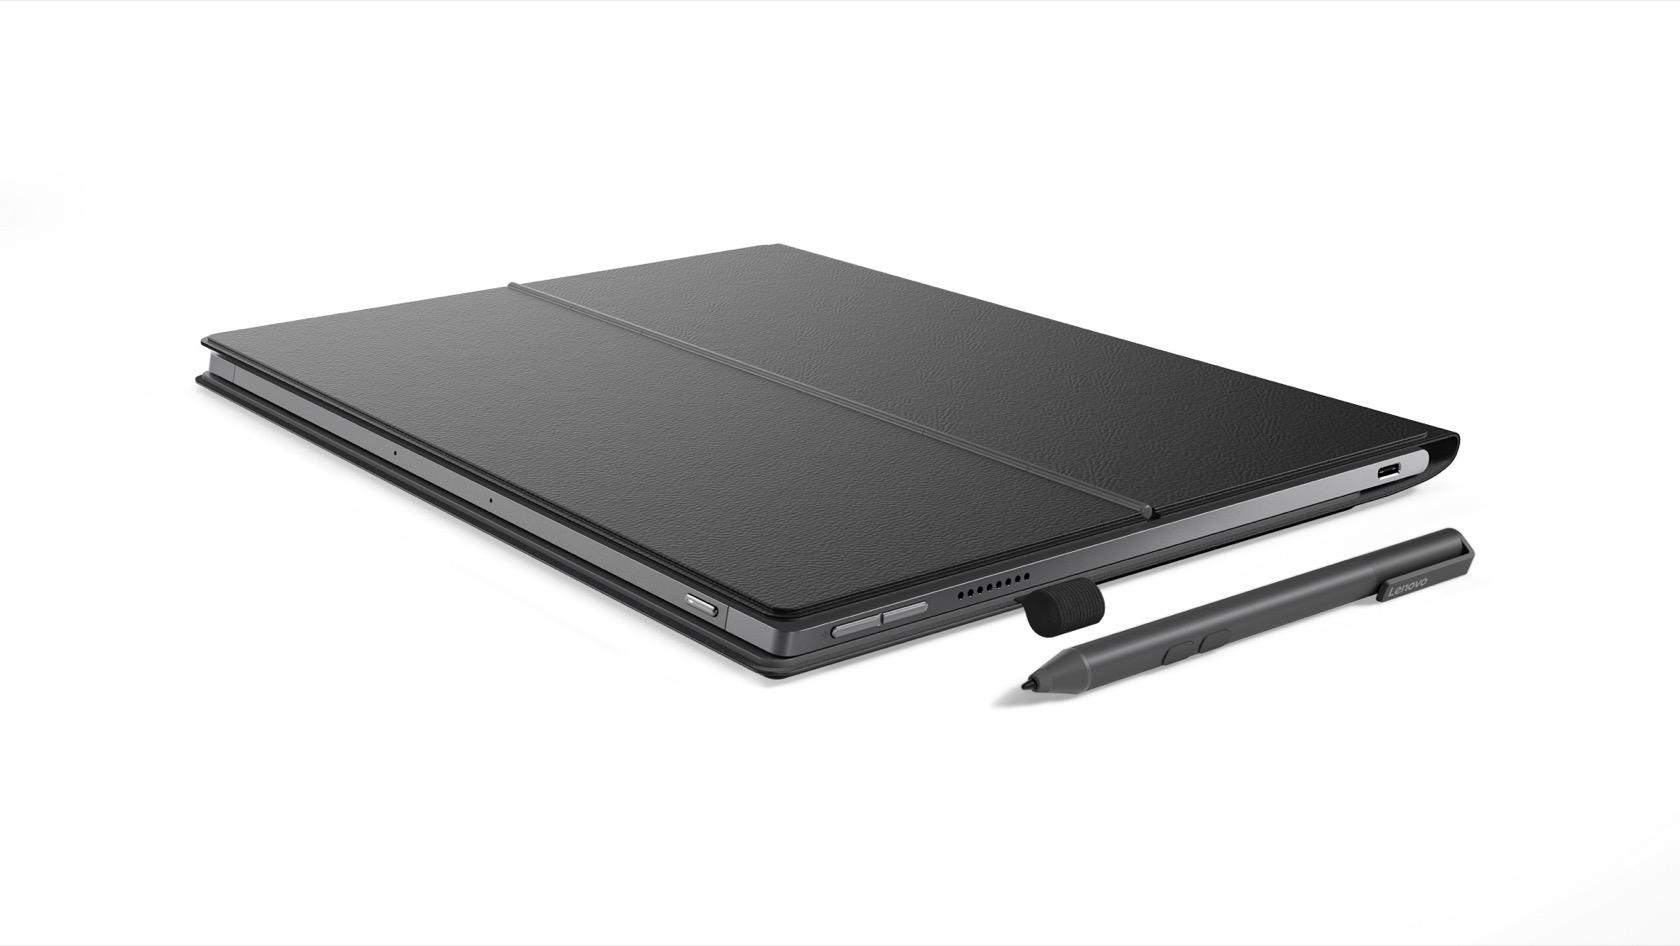 lenovo miix 630 kaufen windows 10 arm tablet jetzt in. Black Bedroom Furniture Sets. Home Design Ideas